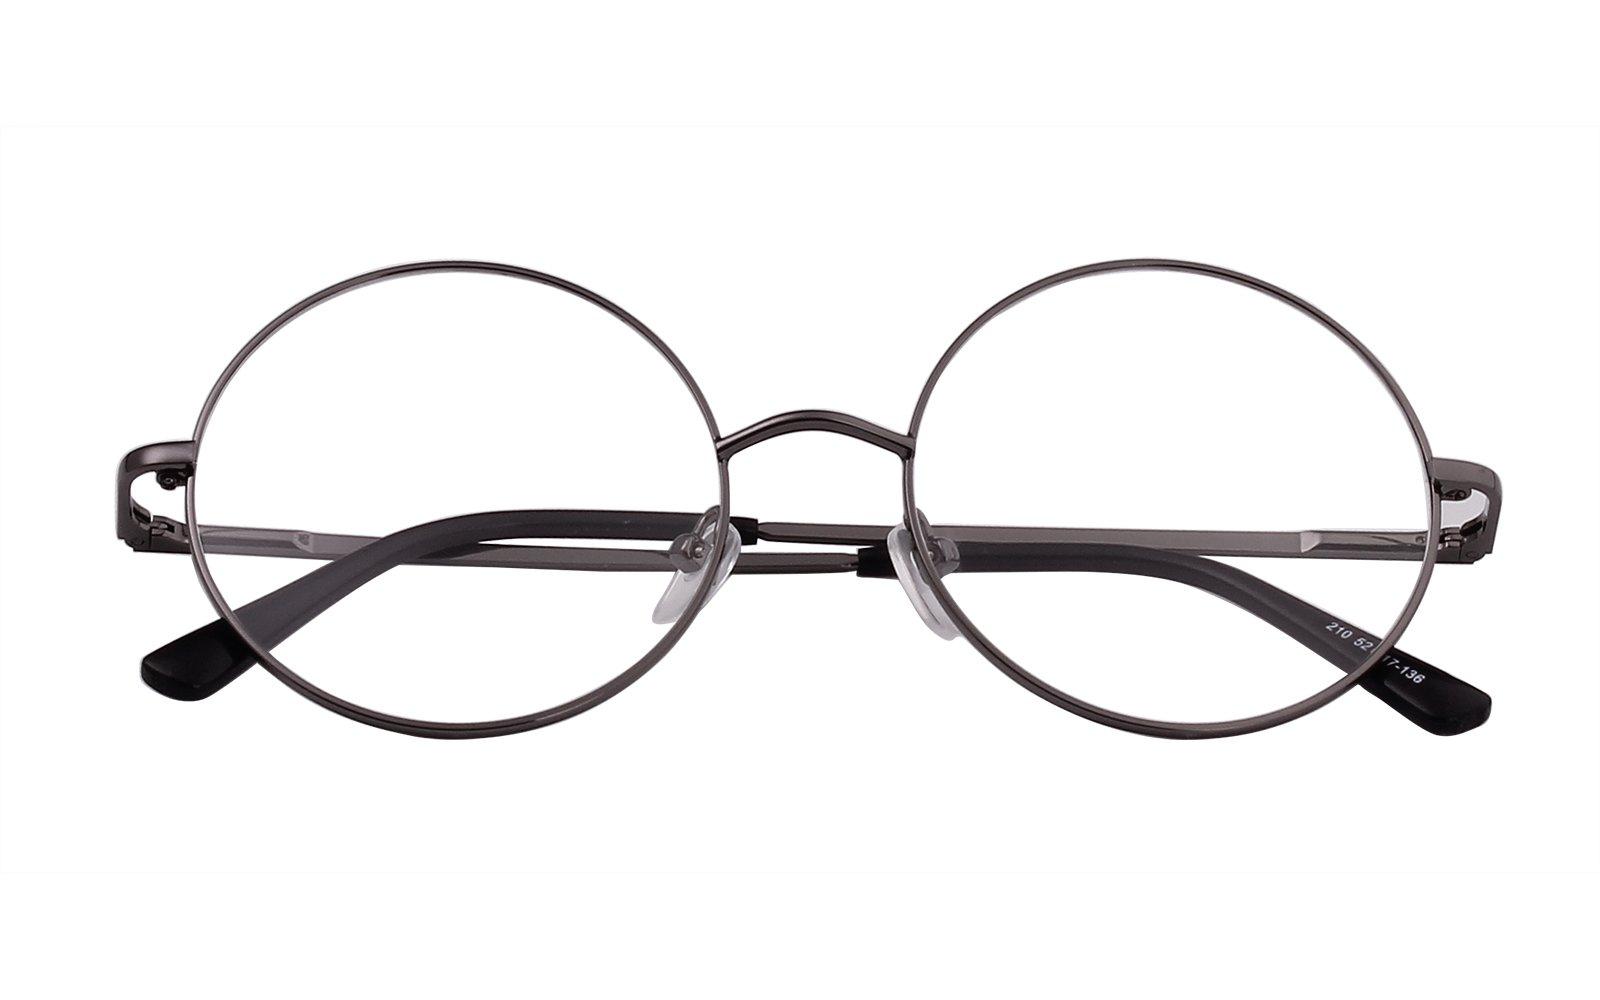 Agstum Retro Round Prescription ready Metal Eyeglasses Frame Clear Lens 51mm (X-Large Size) (Grey, 51)